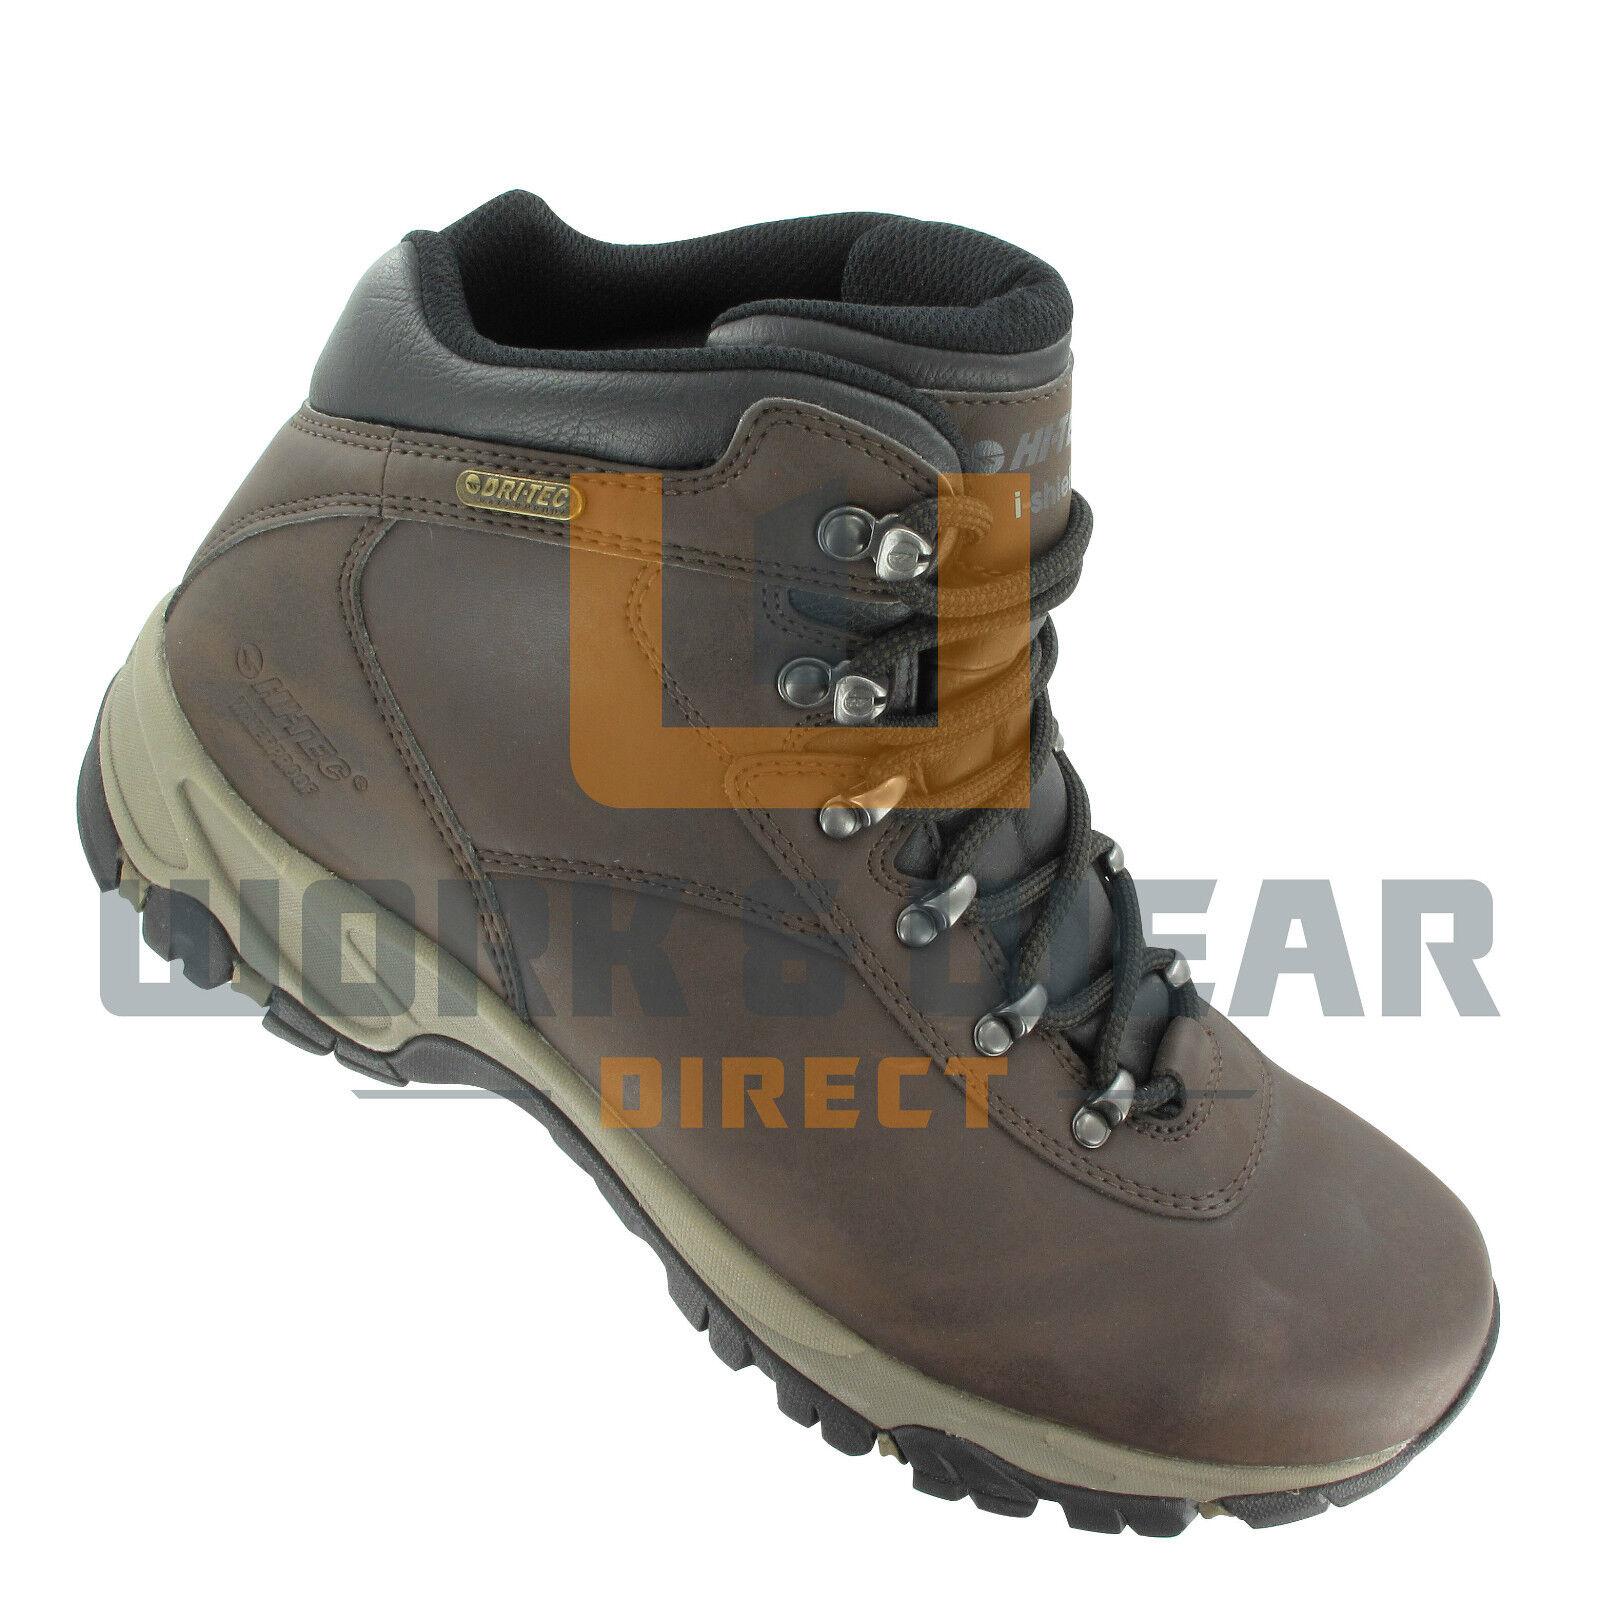 Hi-Tec ALTITUDE V i WP leather lace up waterproof outdoor outdoor outdoor hiking botas Marrón 209cf5